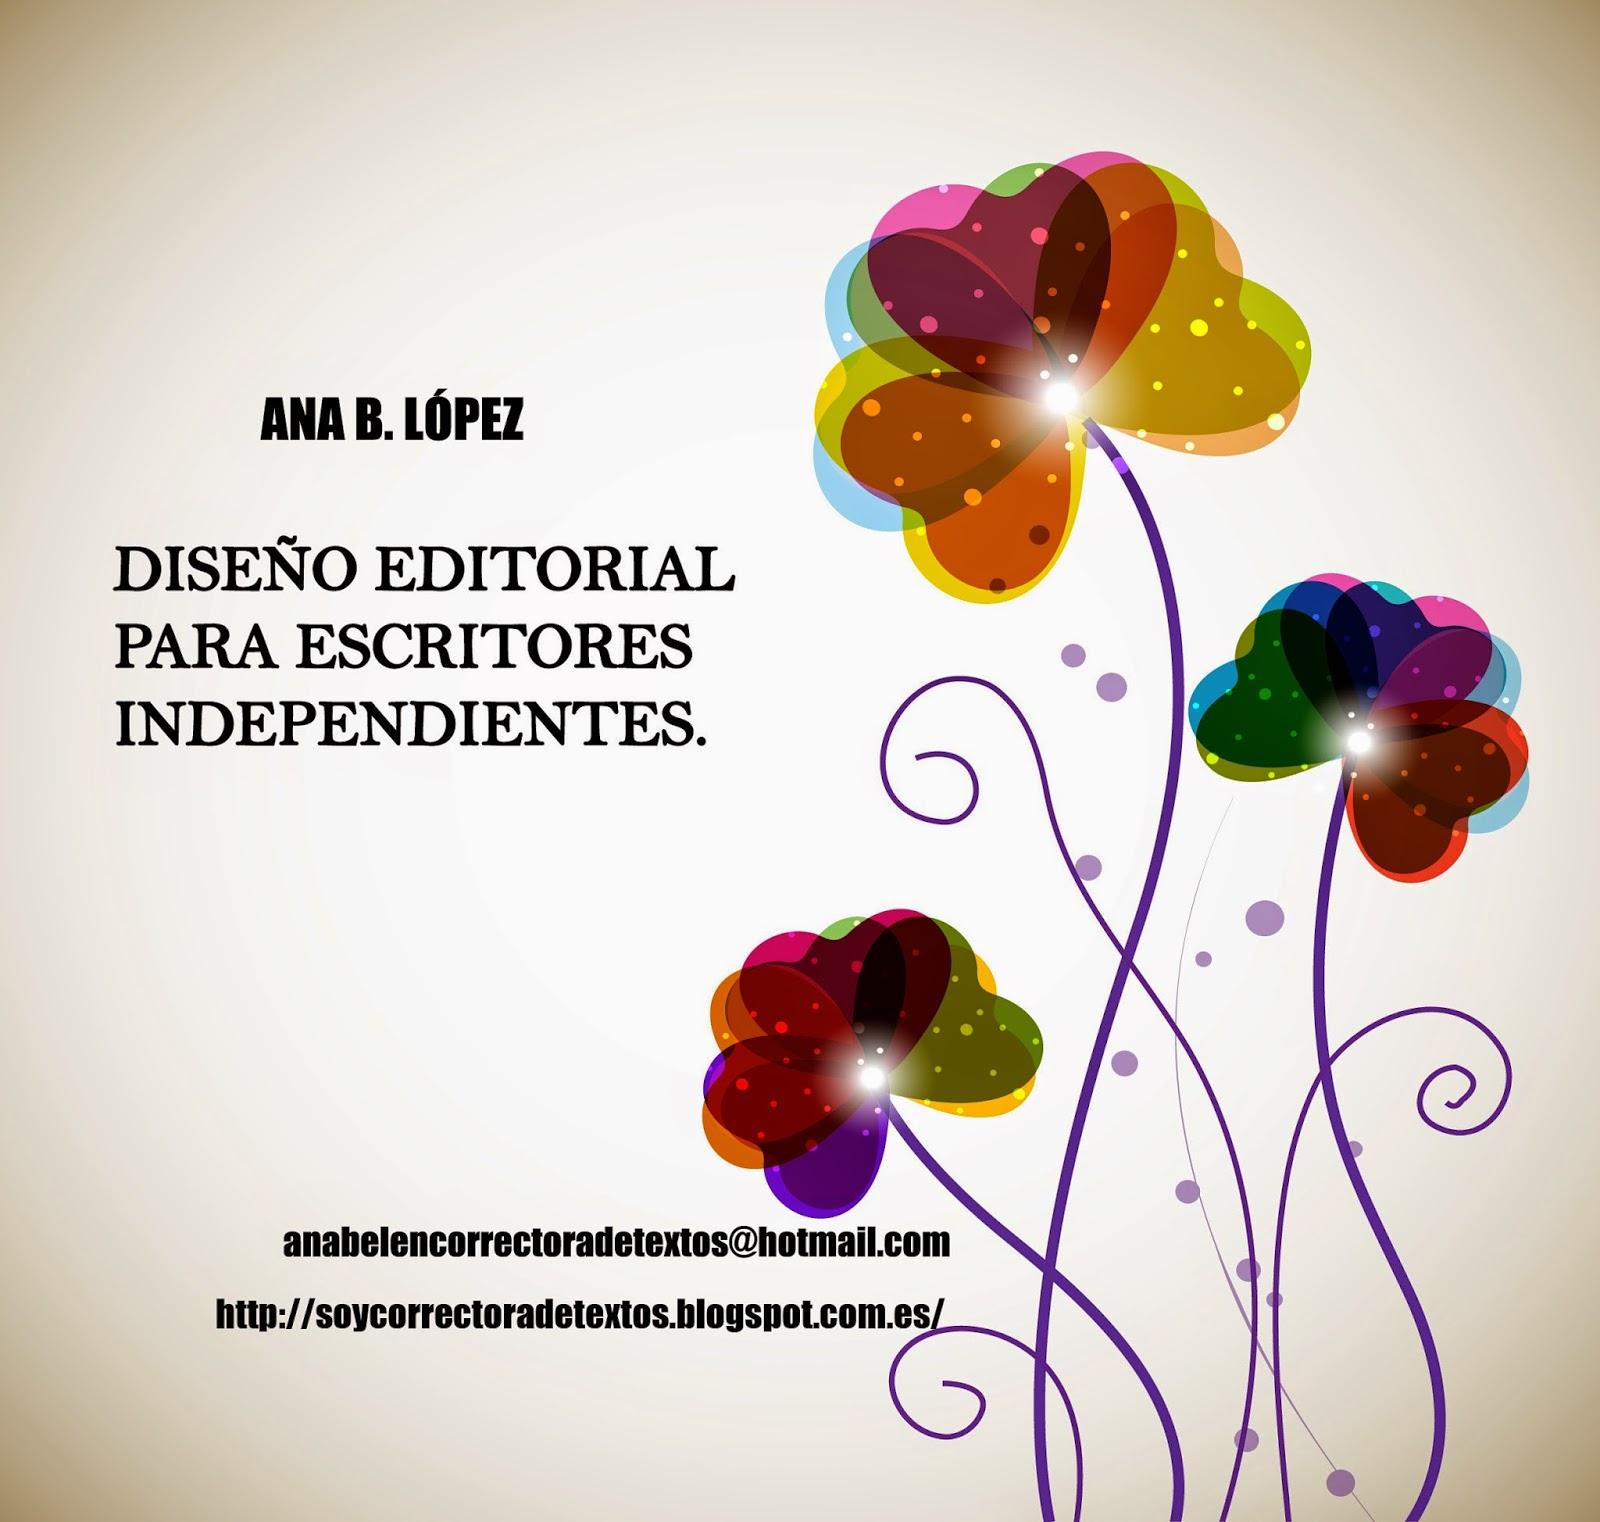 http://libroshistoriasyyo.blogspot.com.es/2015/03/ana-b-lopez.html